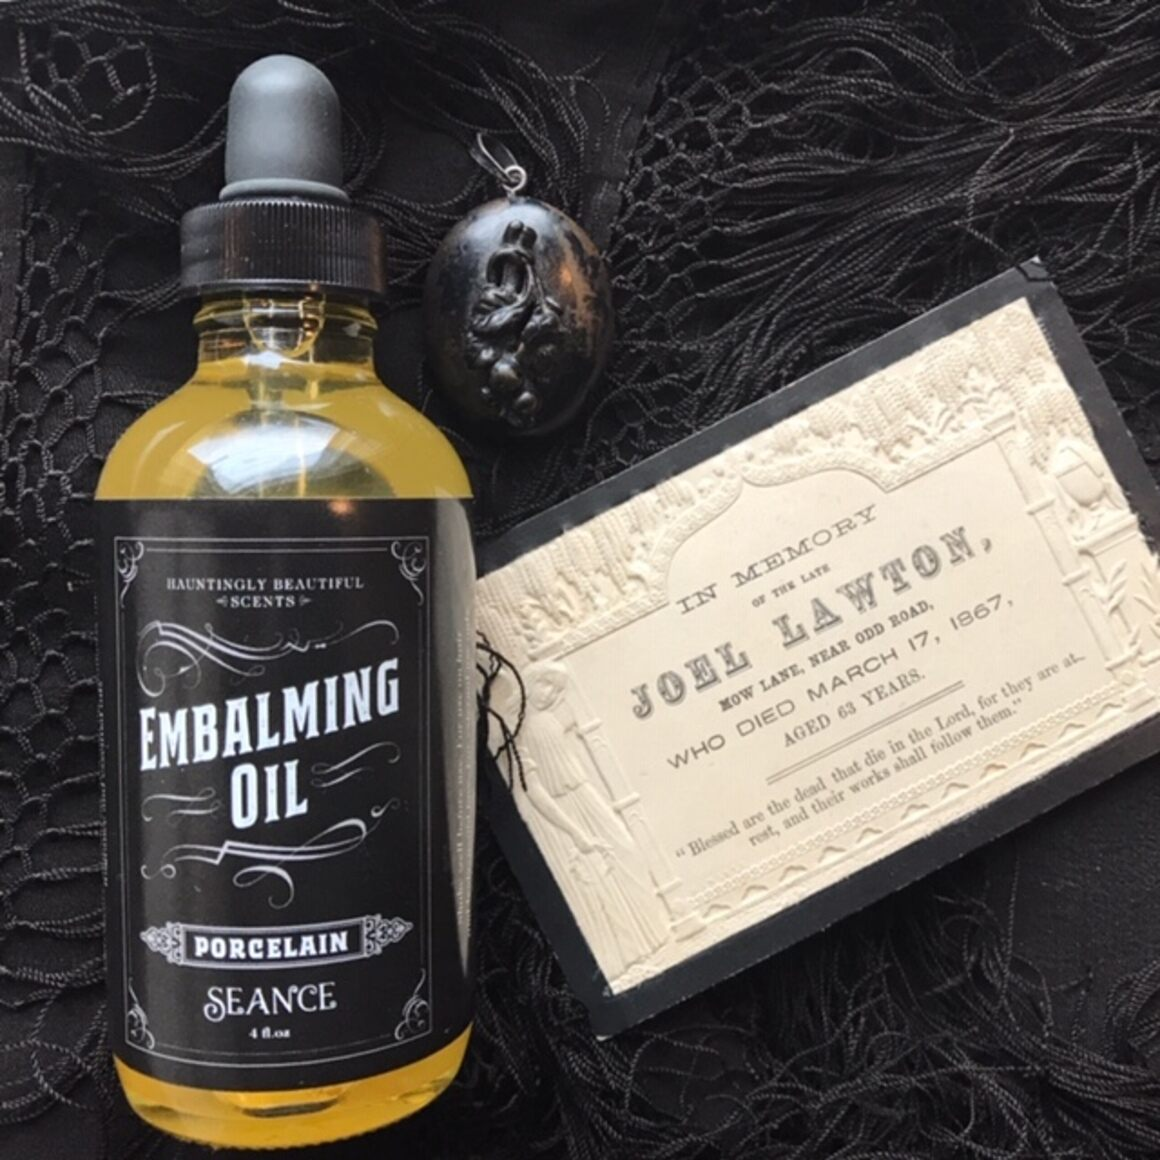 Embalming oil.